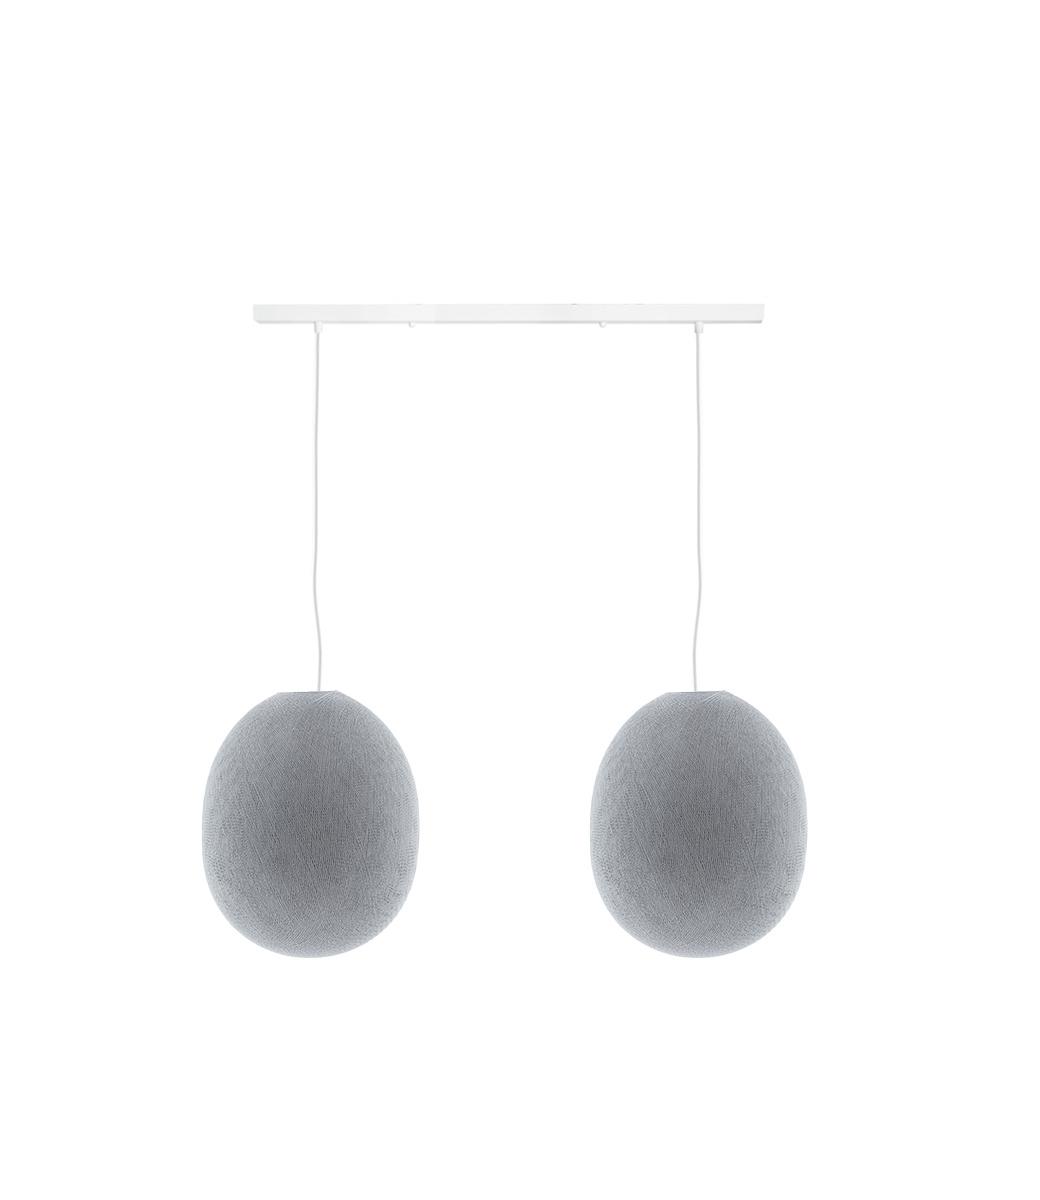 Cotton Ball Lights Tweevoudige hanglamp balk - Oval Stone